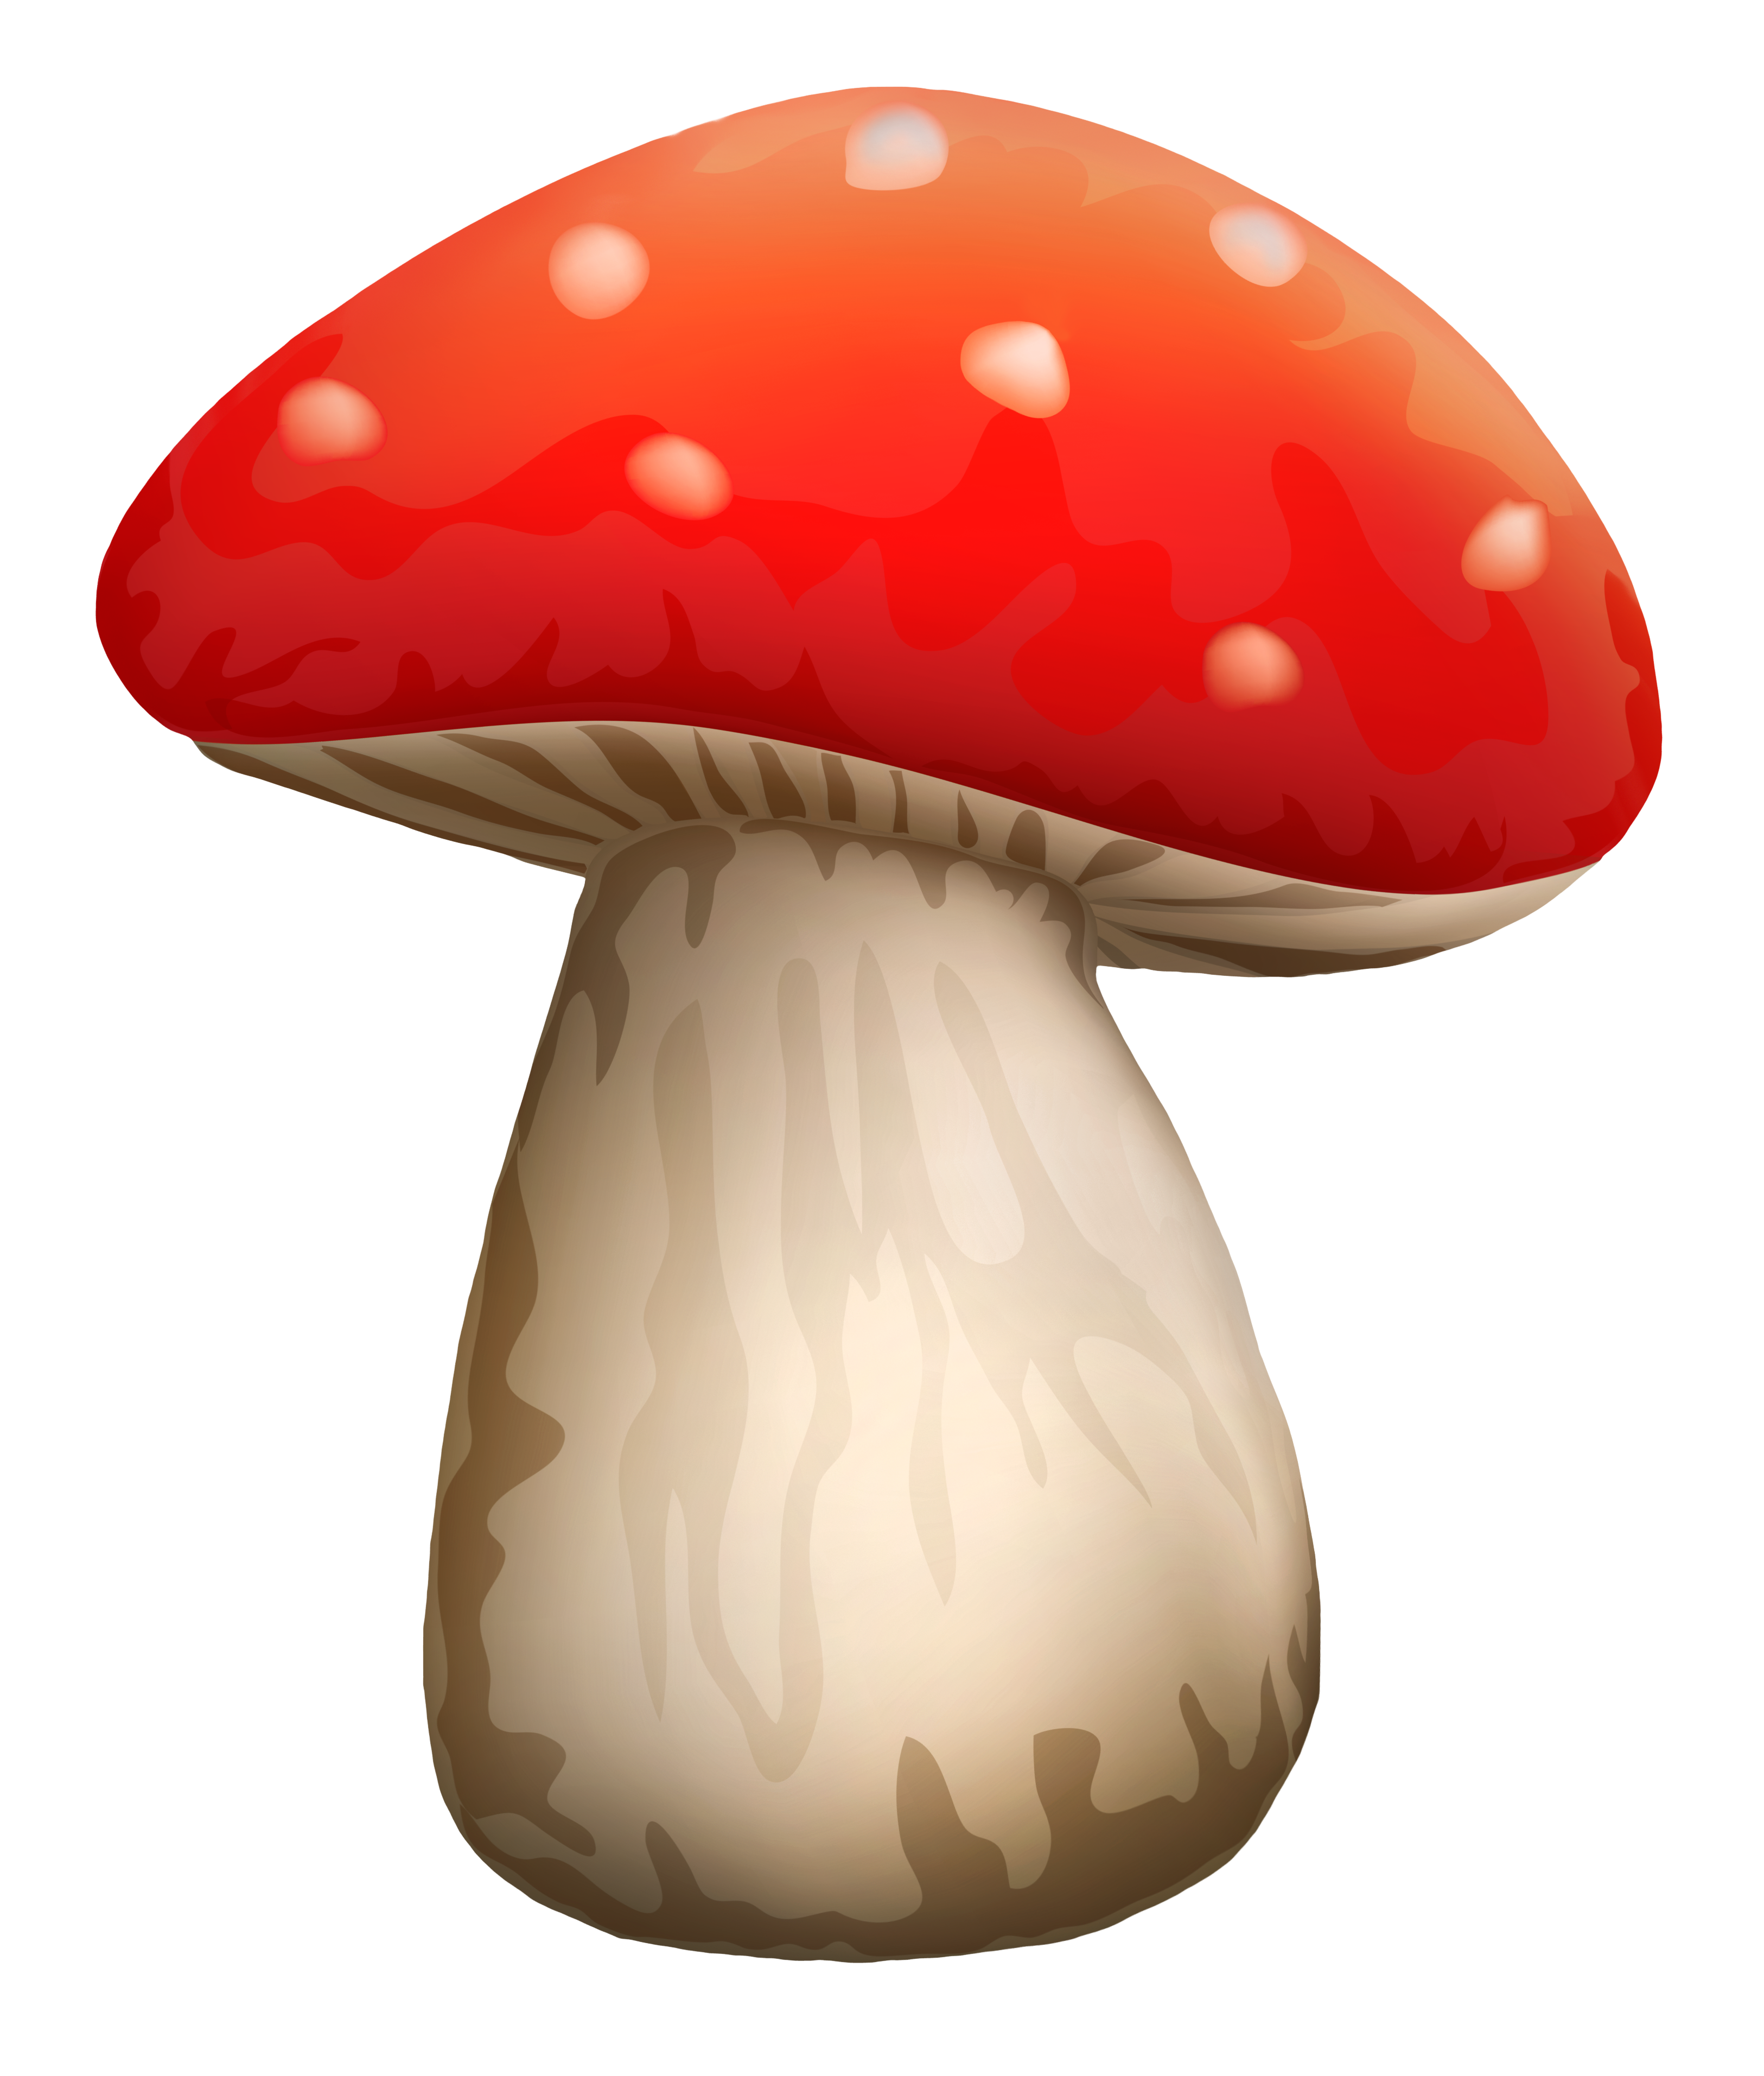 Mushroom clipart white dot #1 - Toadstool PNG HD